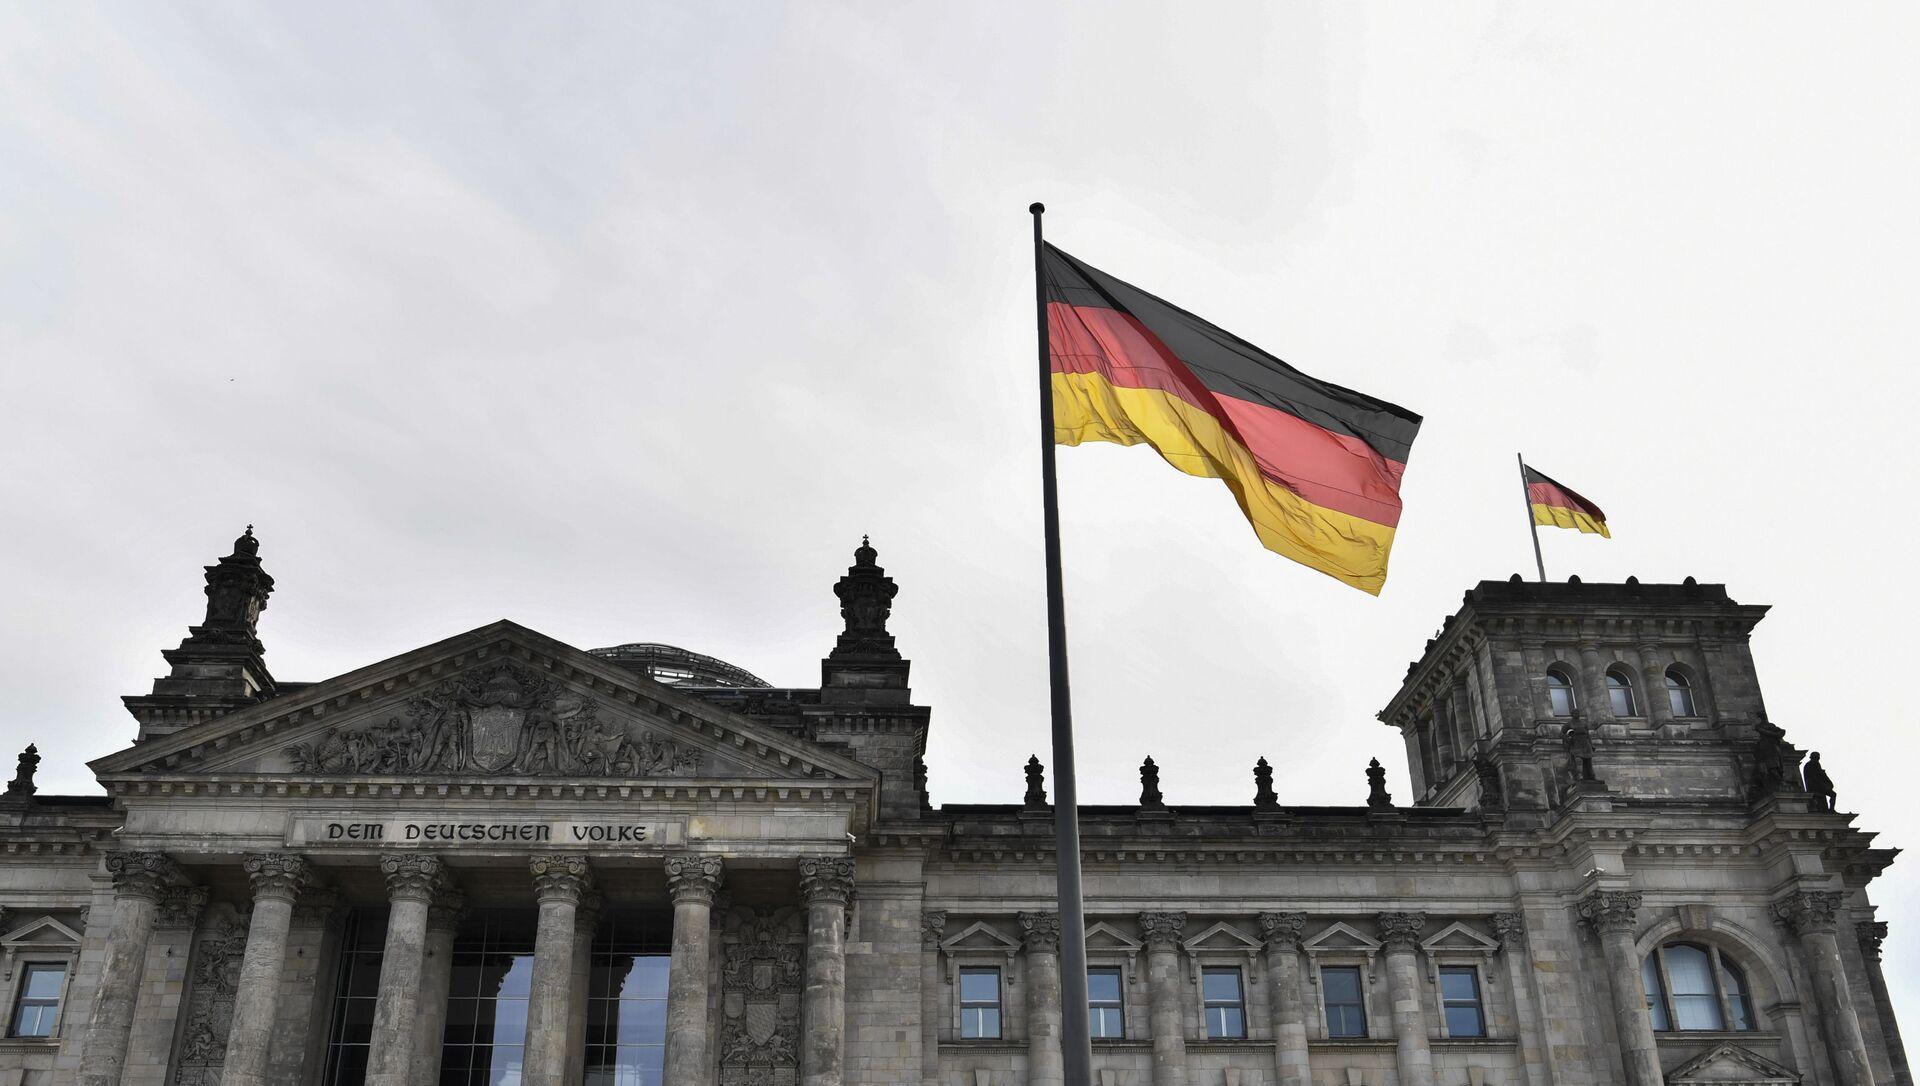 Флаг Германии над зданием парламента в Берлине, фото из архива - Sputnik Азербайджан, 1920, 24.08.2021